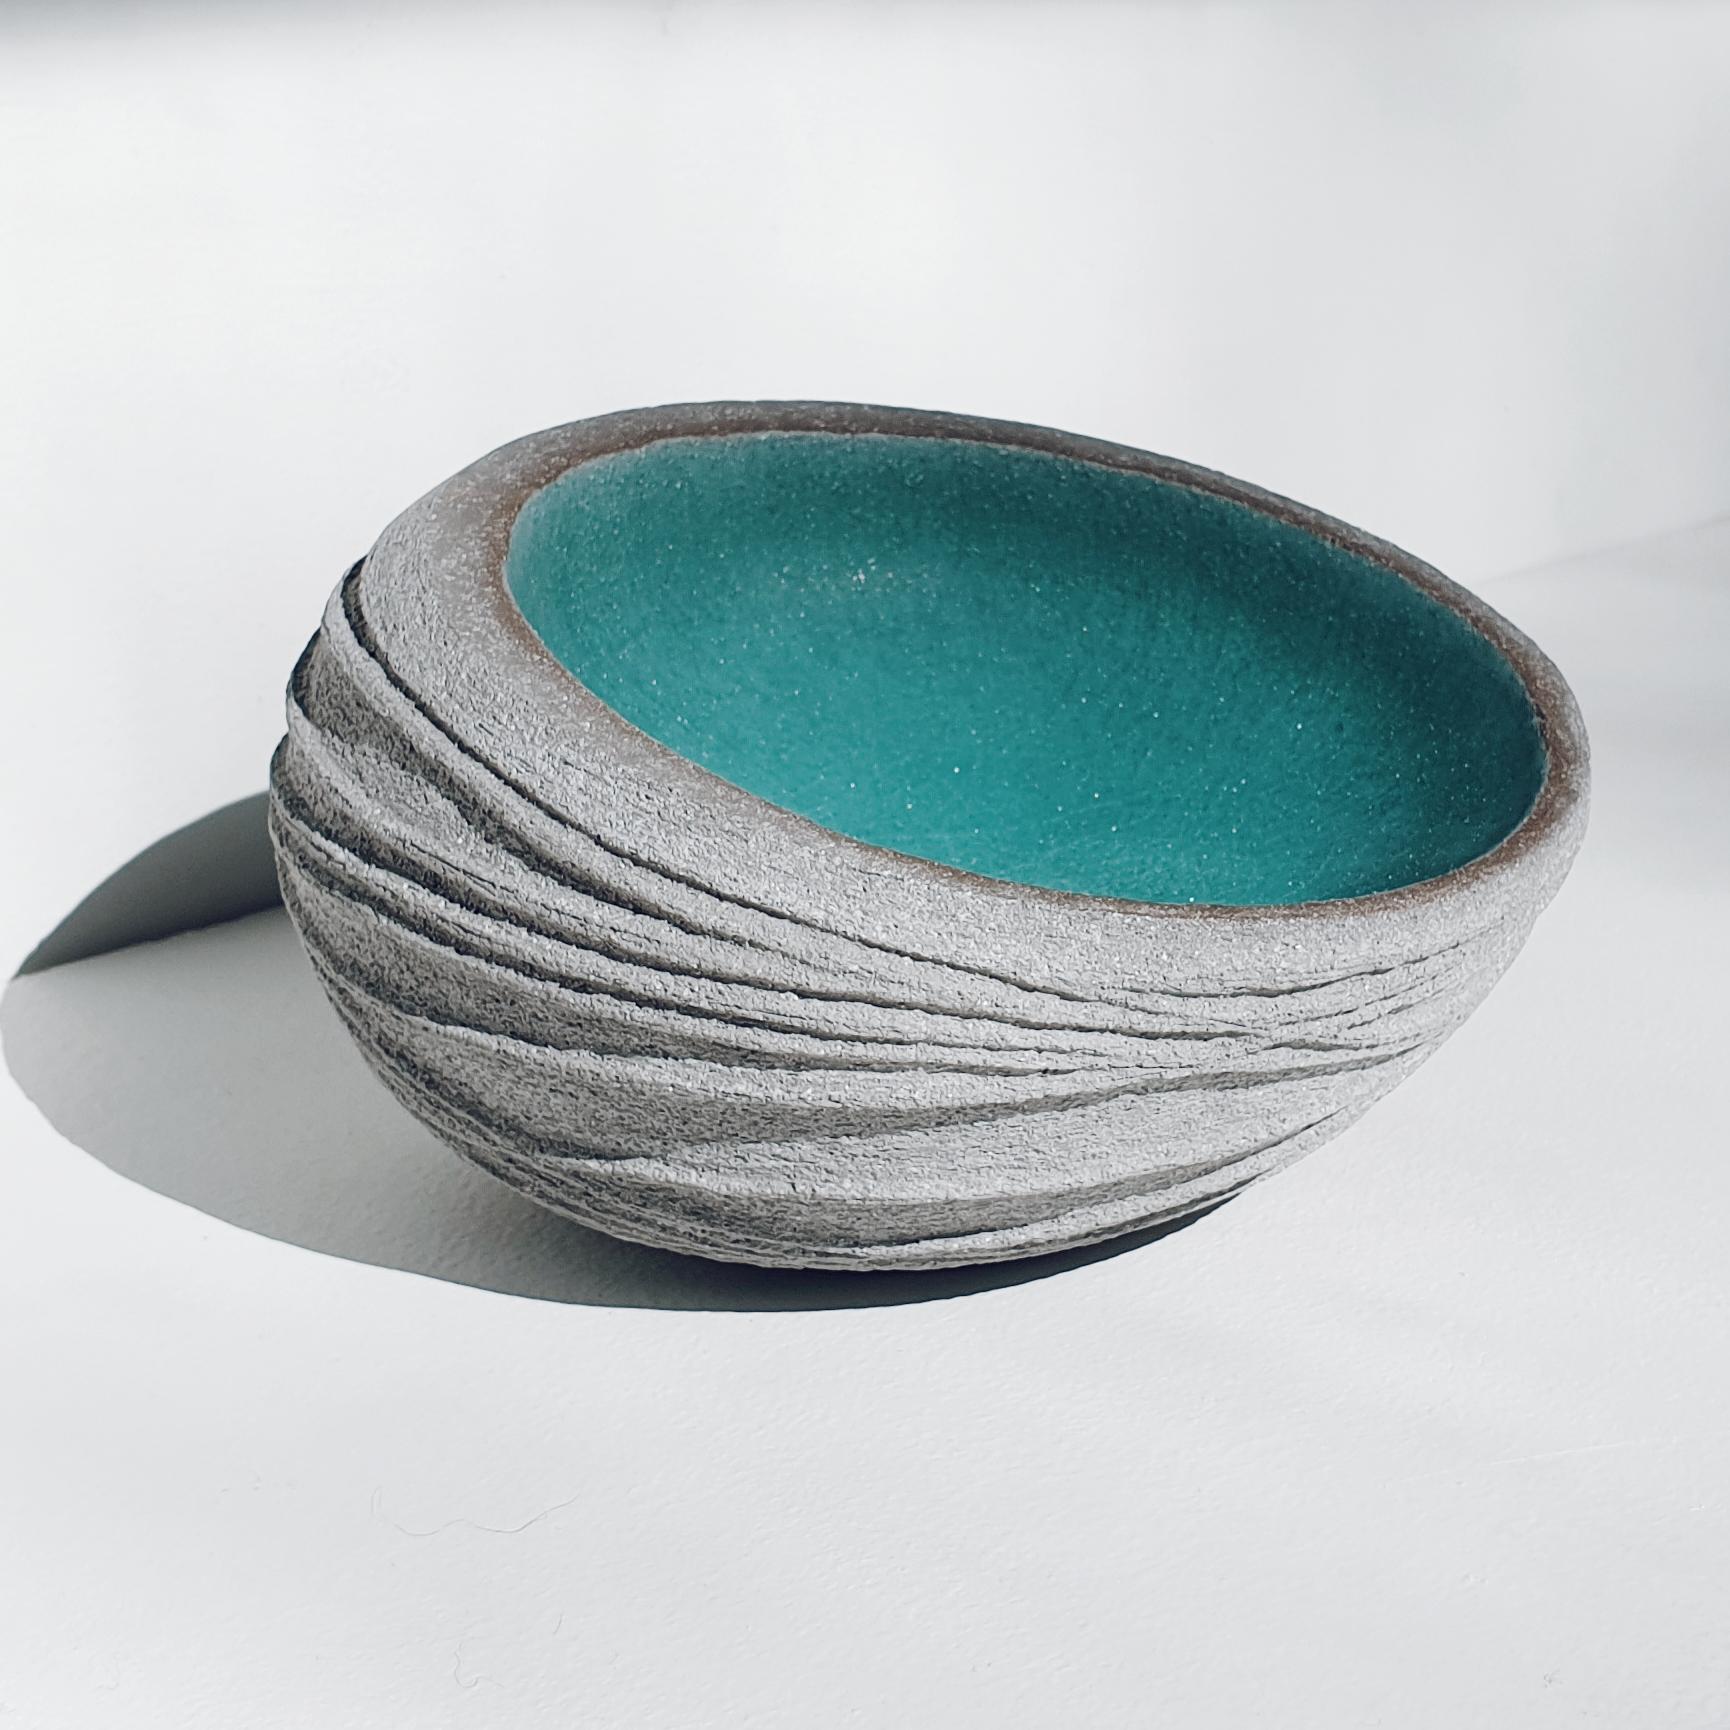 Michele Bianco. Nest Form (sea green)